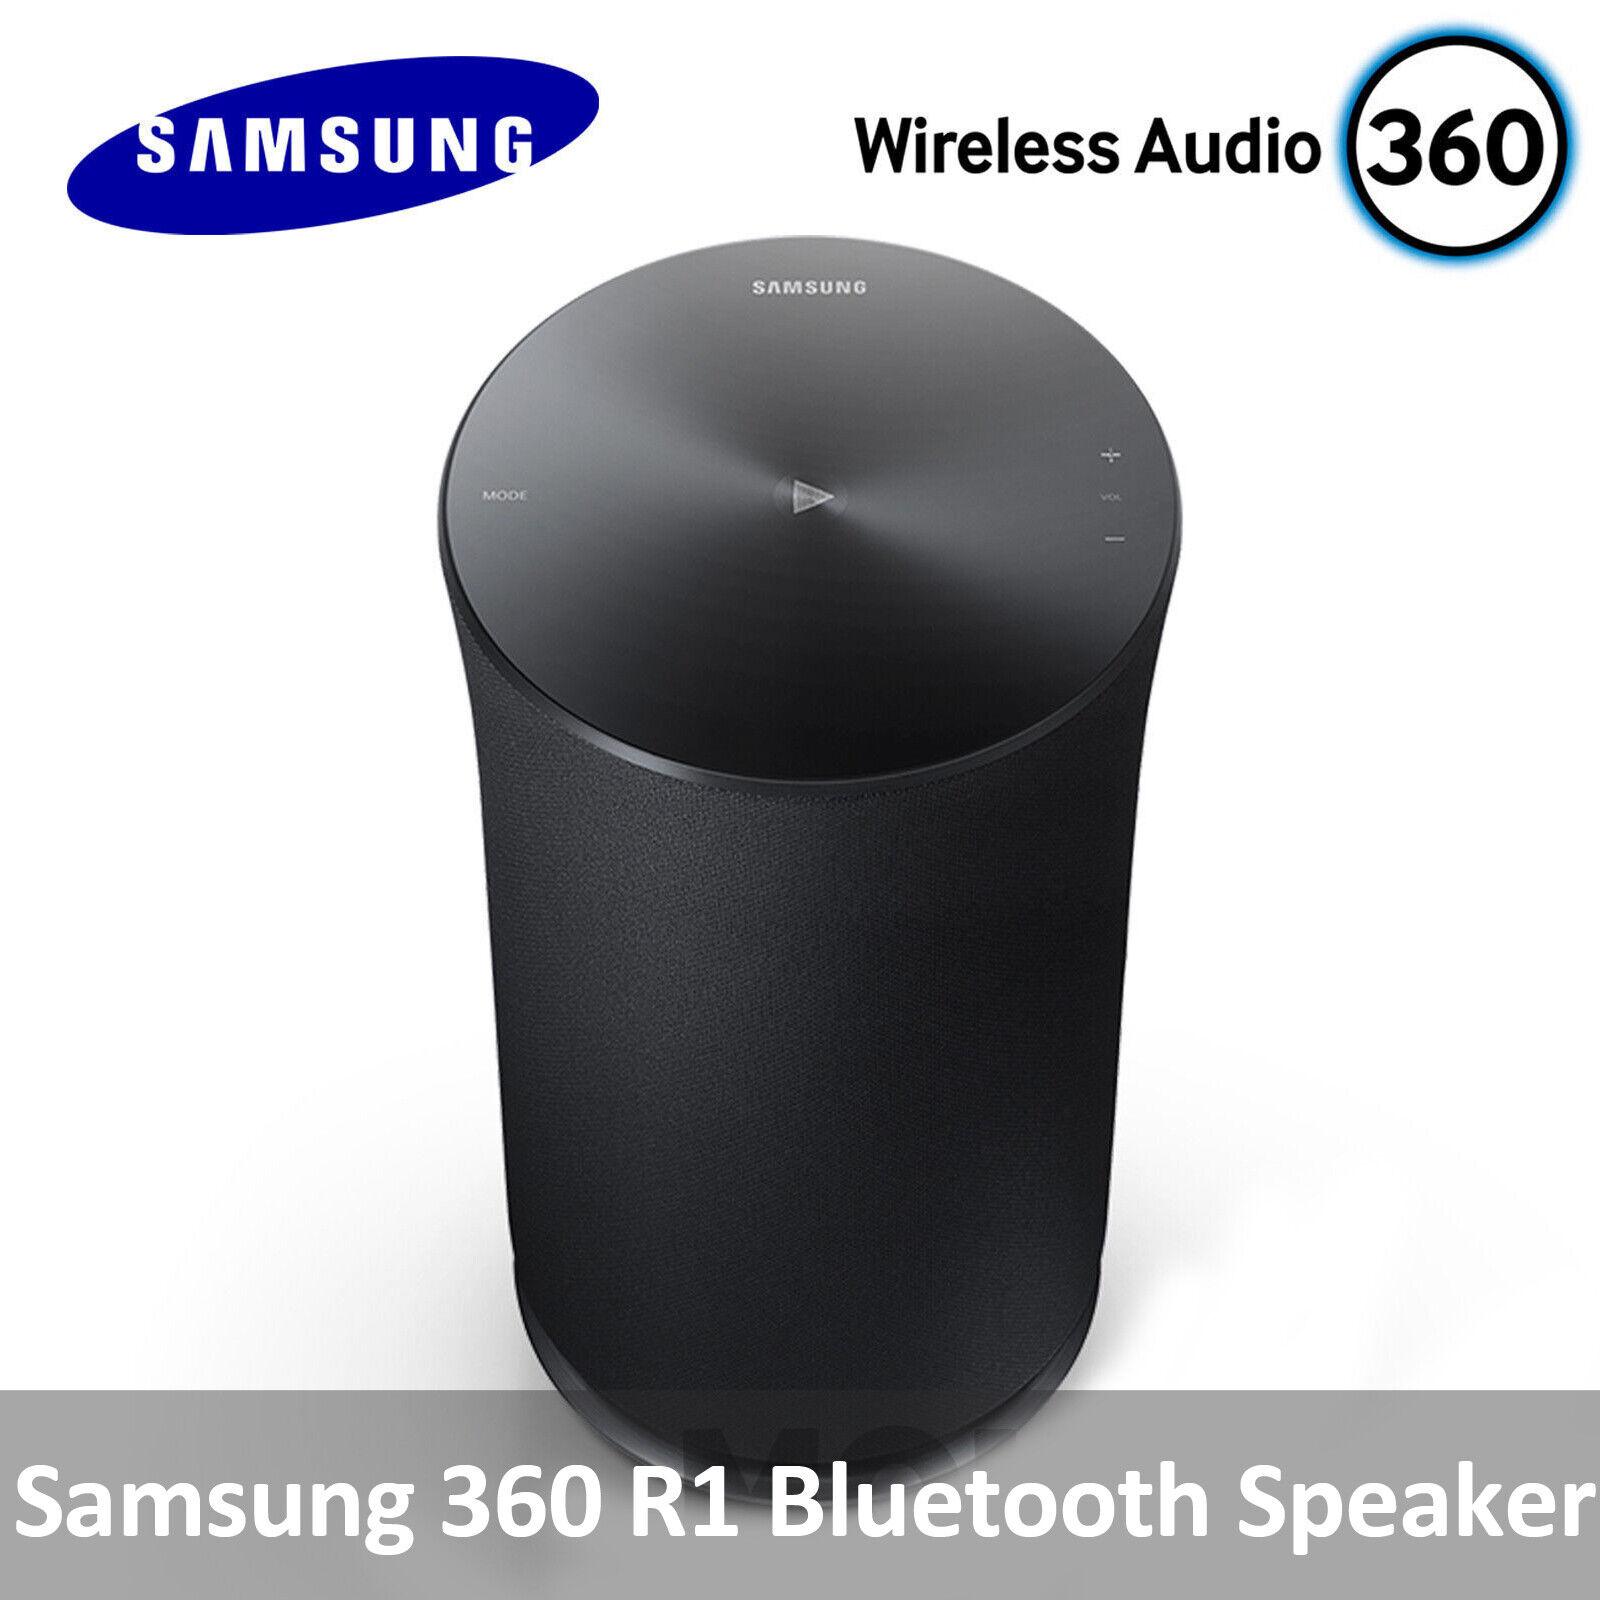 Details about Samsung WAM100 Radiant100 R10 Wireless Omnidirectional  Bluetooth Speaker - Fedex